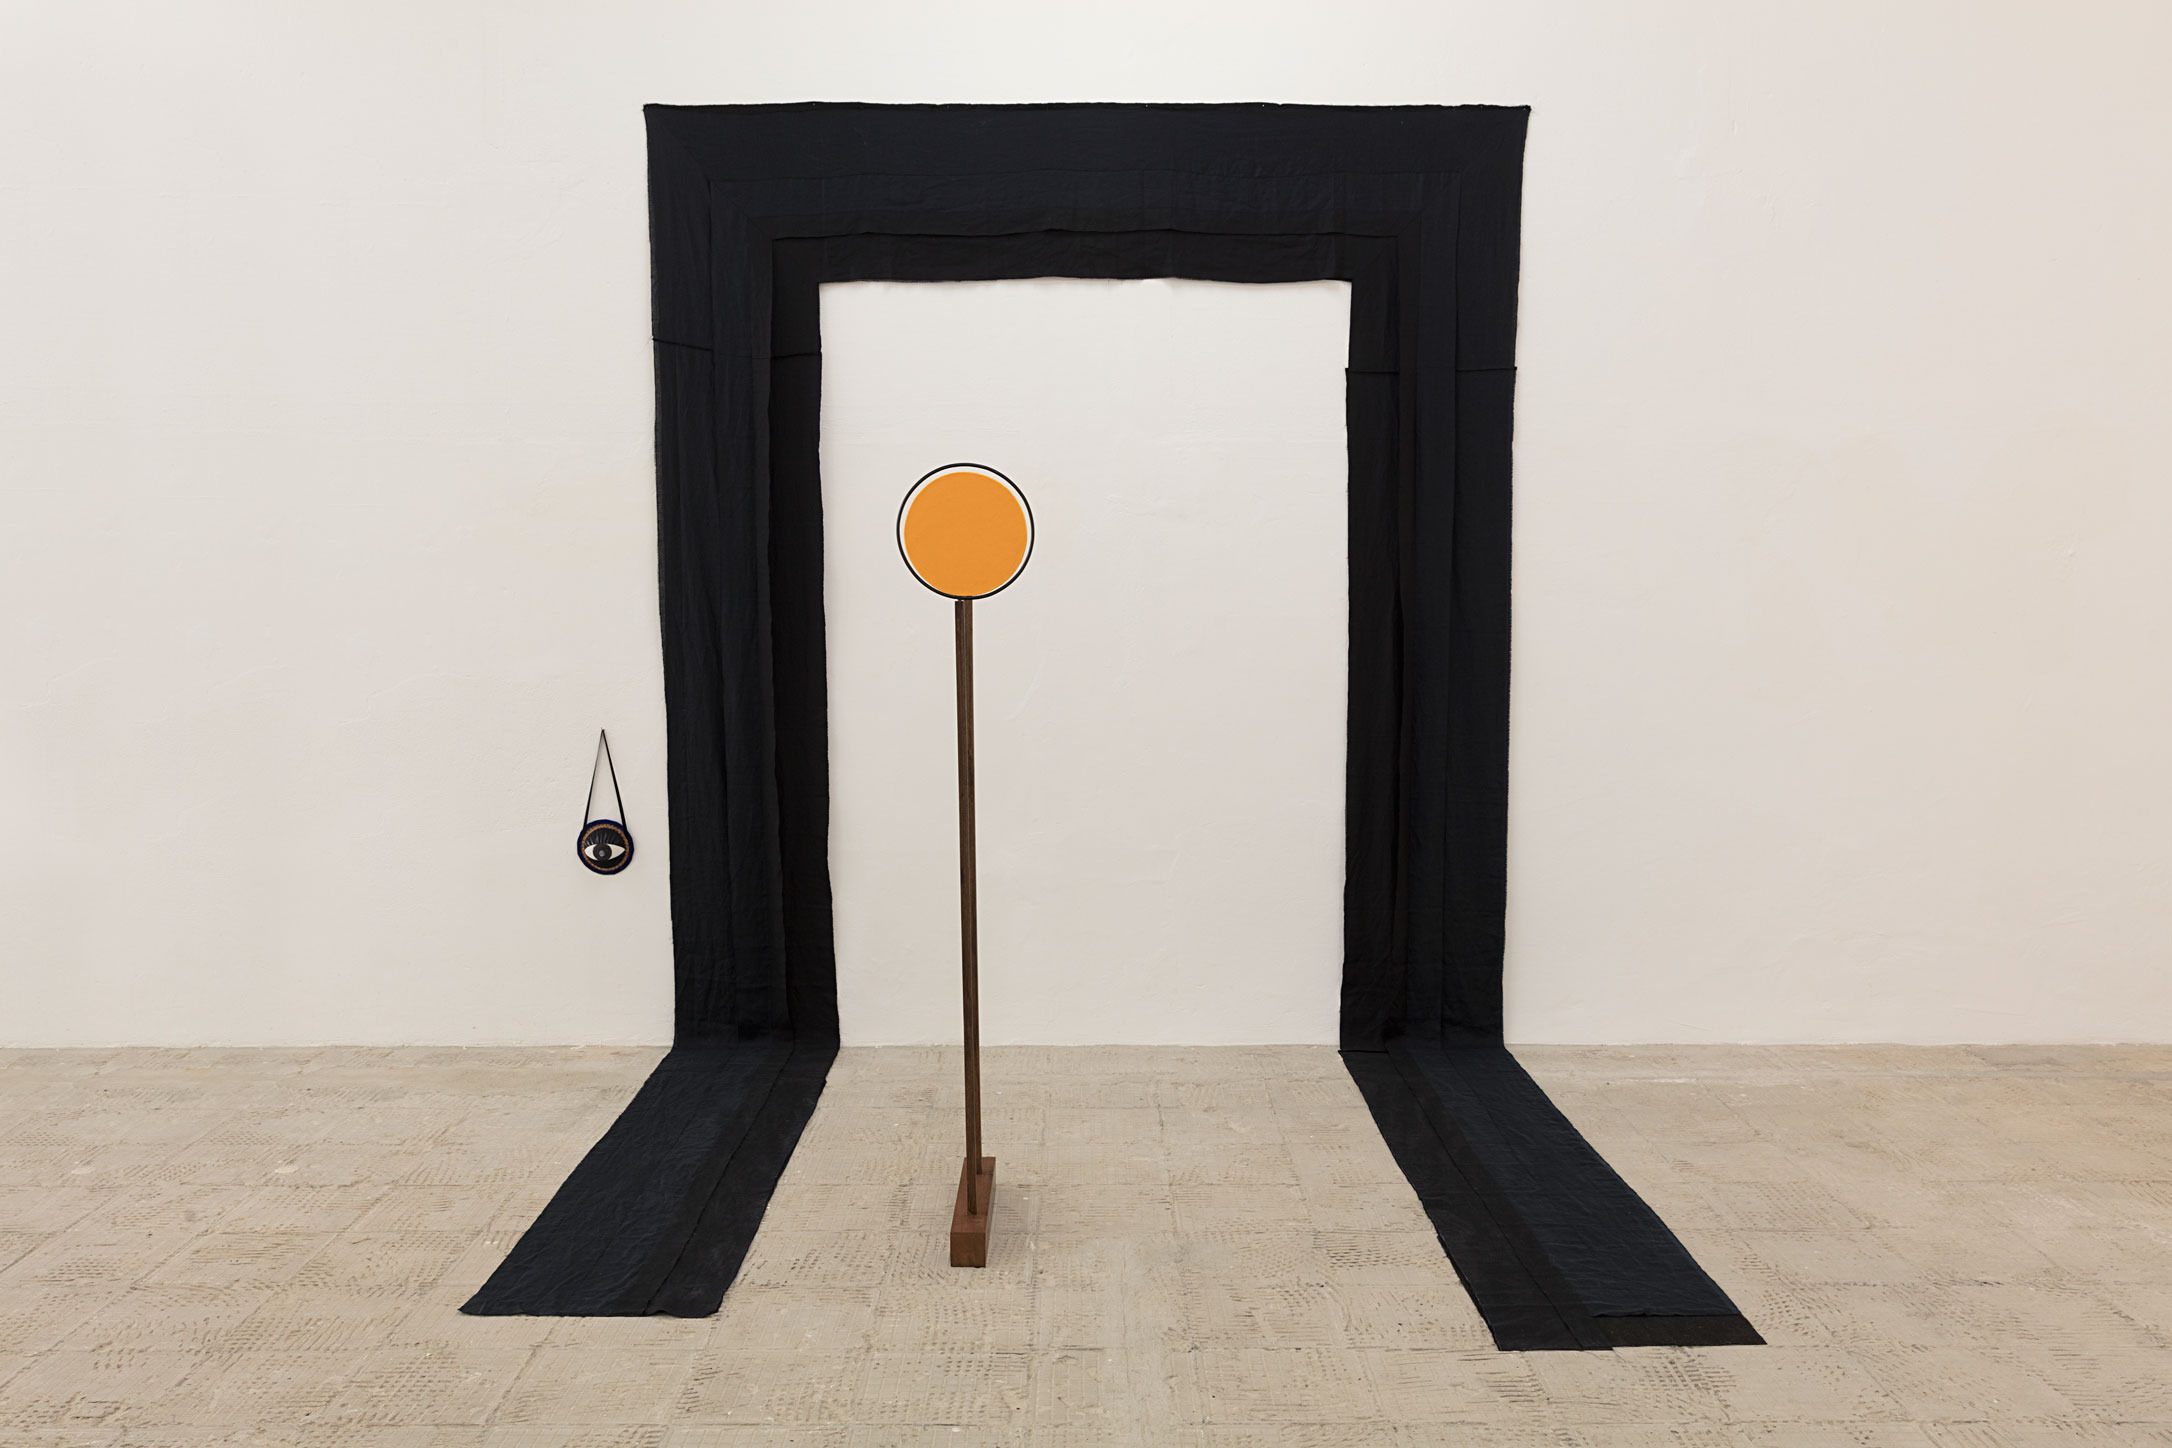 Galeria Jaqueline Martins - Ana Mazzei